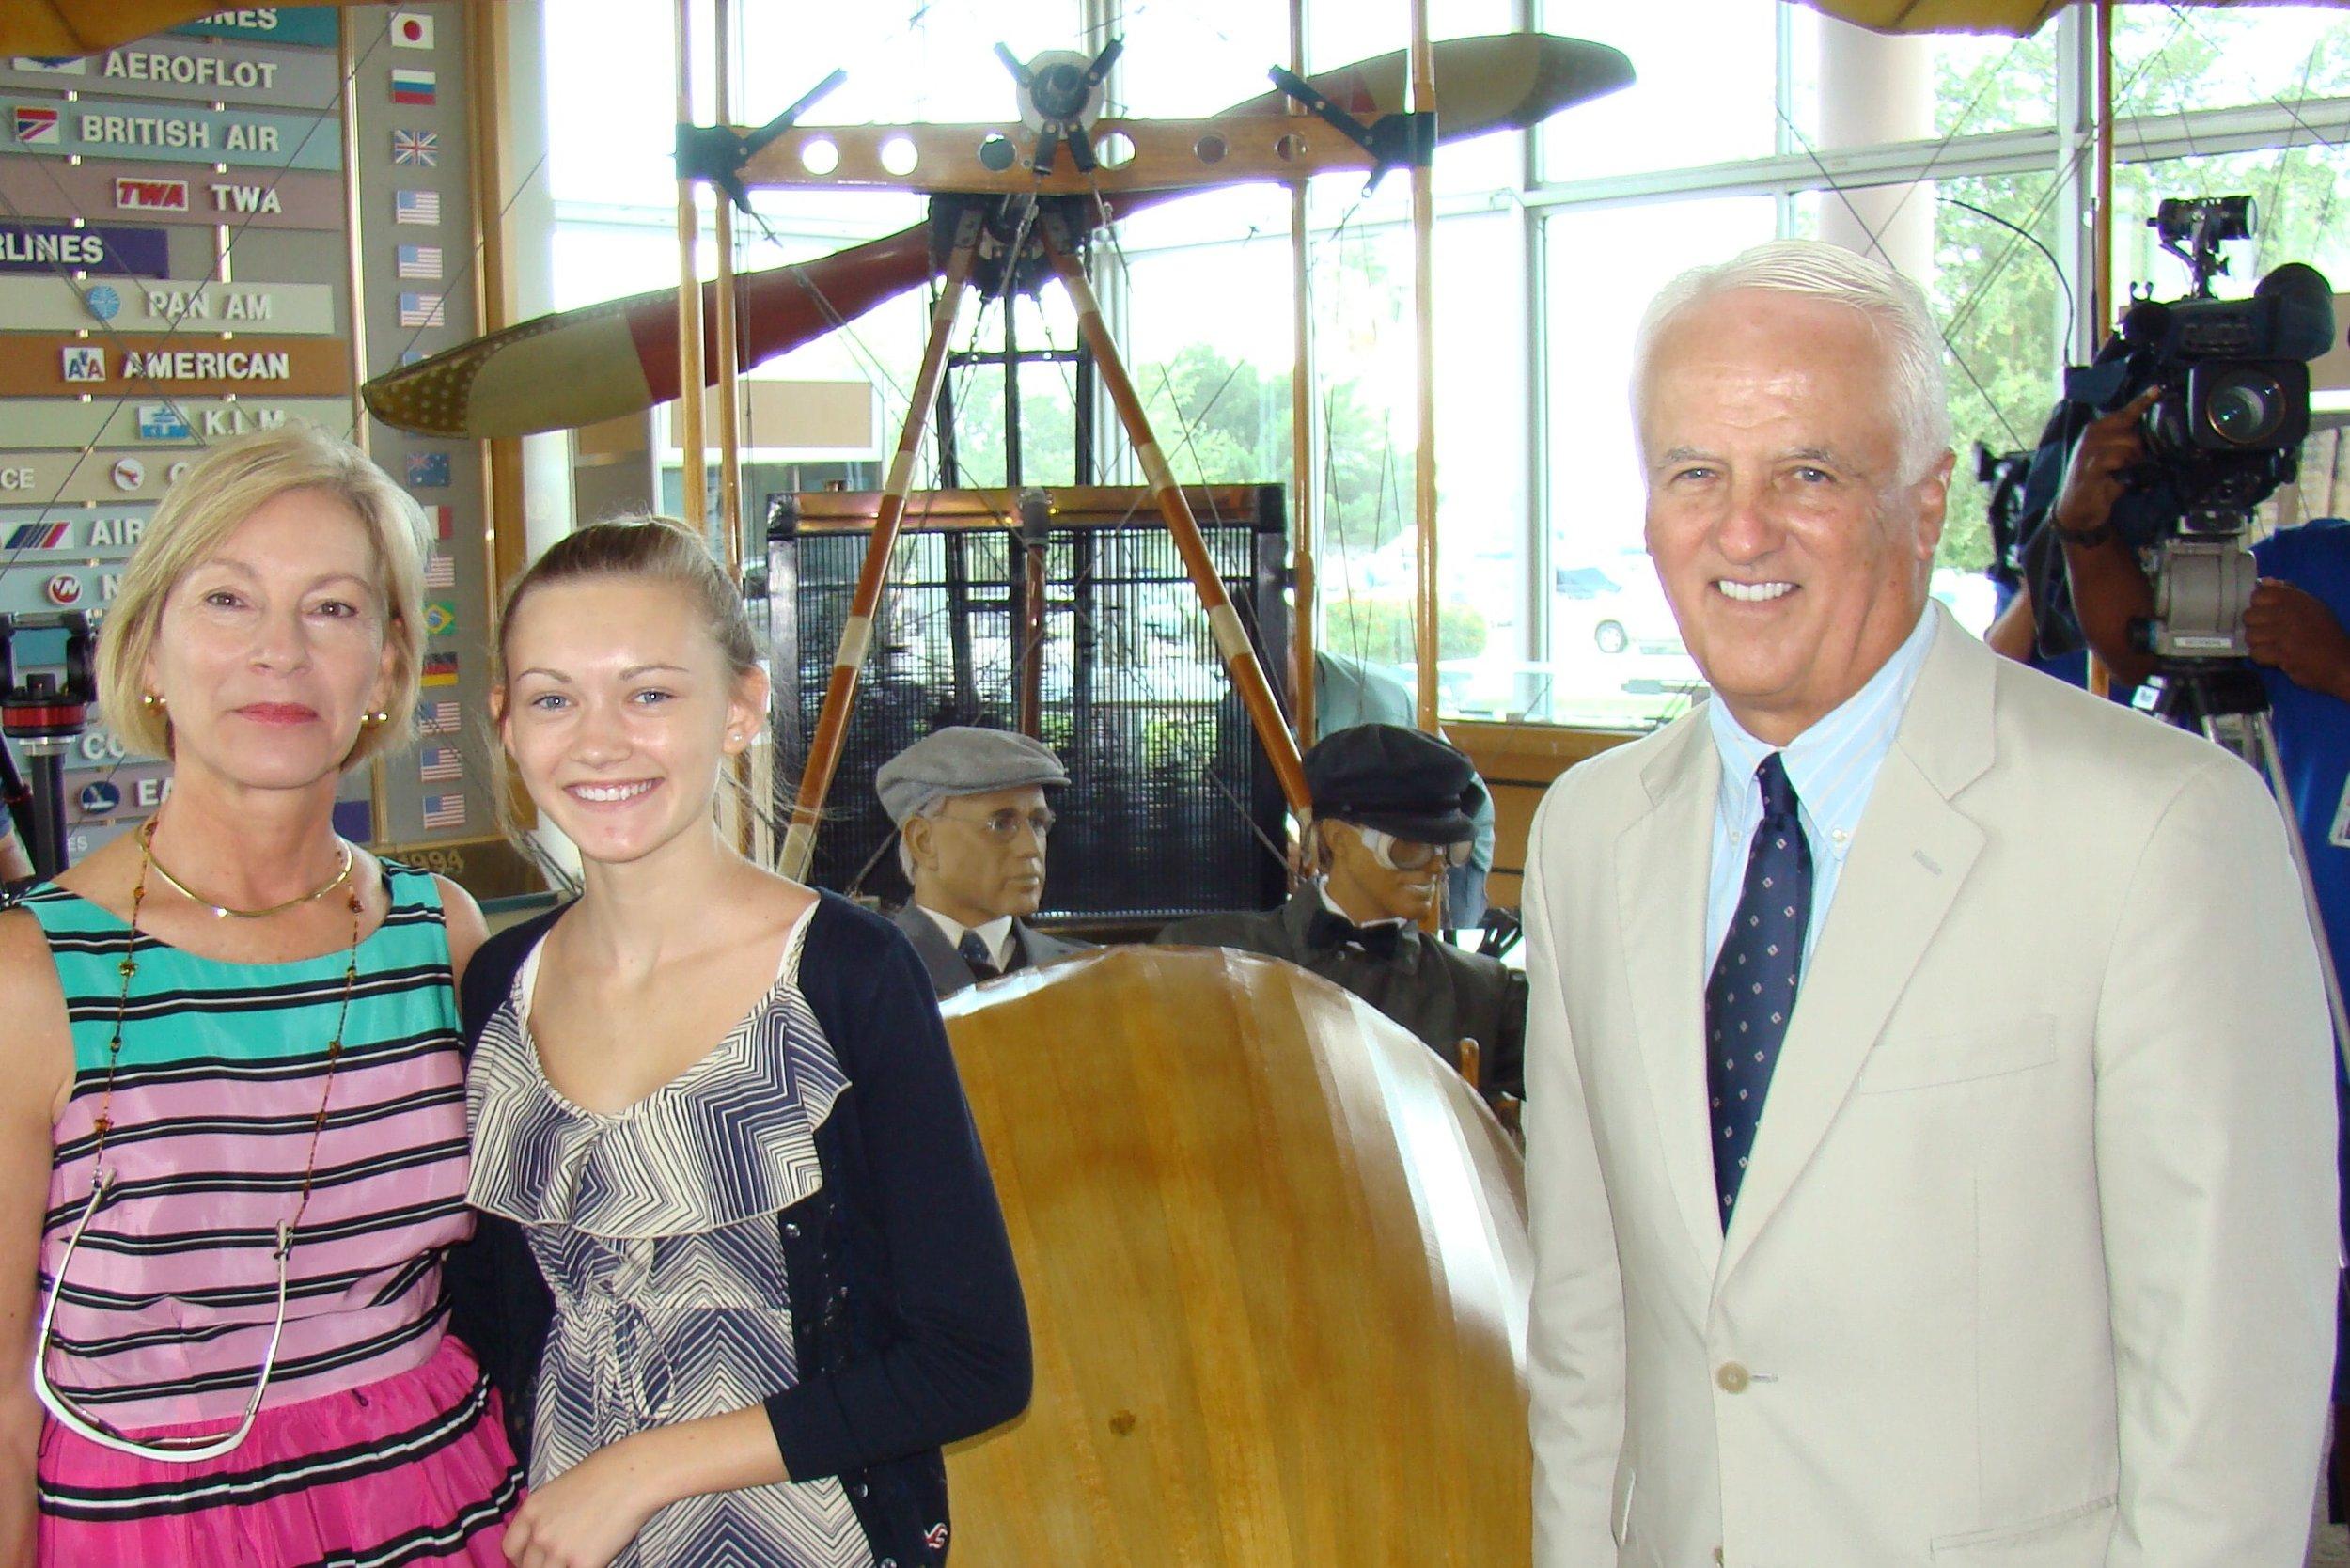 John & Rosie O'Connor with Rachael - 2, 14 Jun '12.JPG